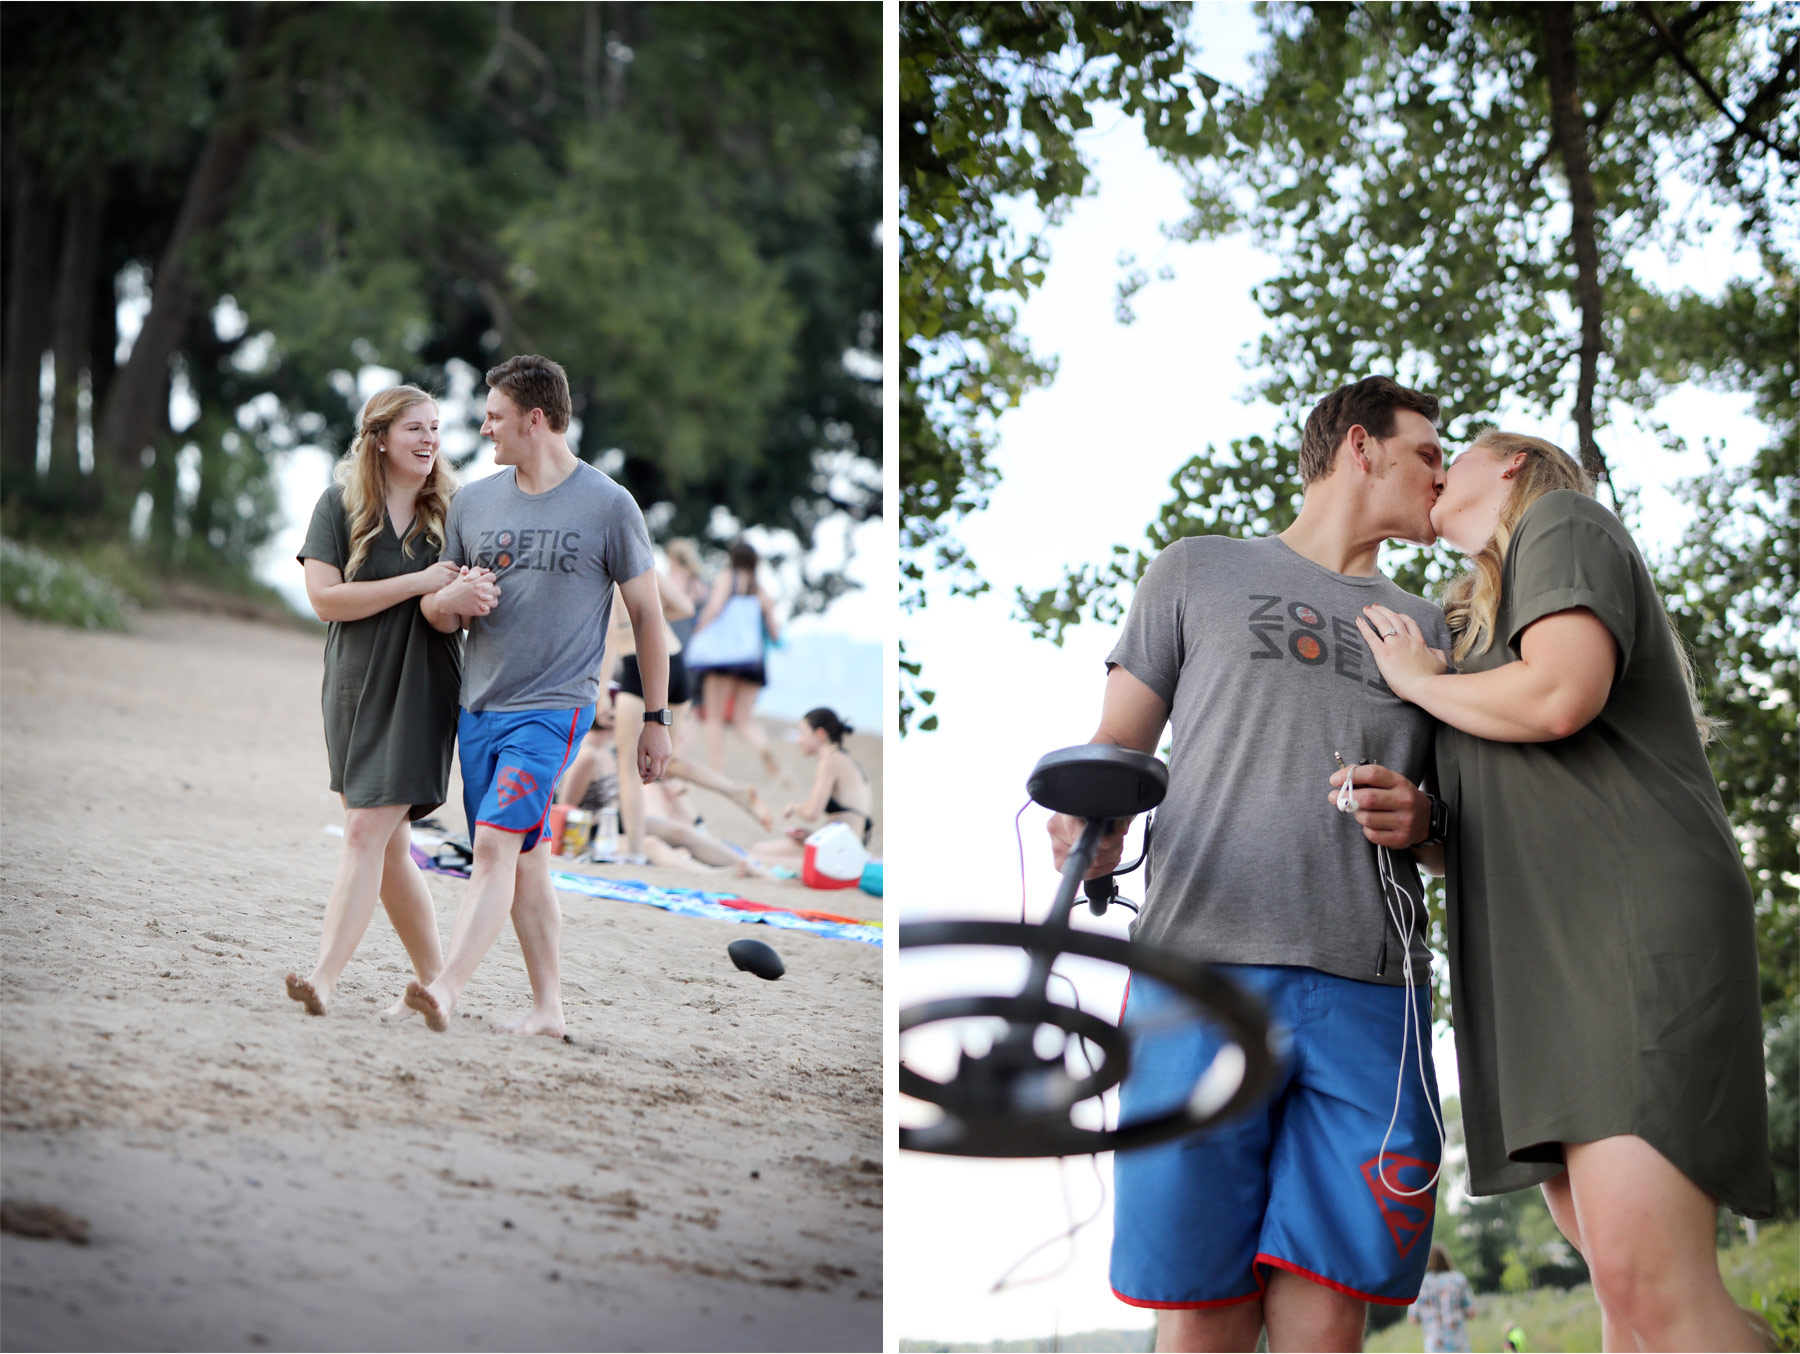 09-Vick-Photography-Proposal-Minnesota-Minneapolis-Beach-Metal-Detectors-Veronica-and-Tyler.jpg